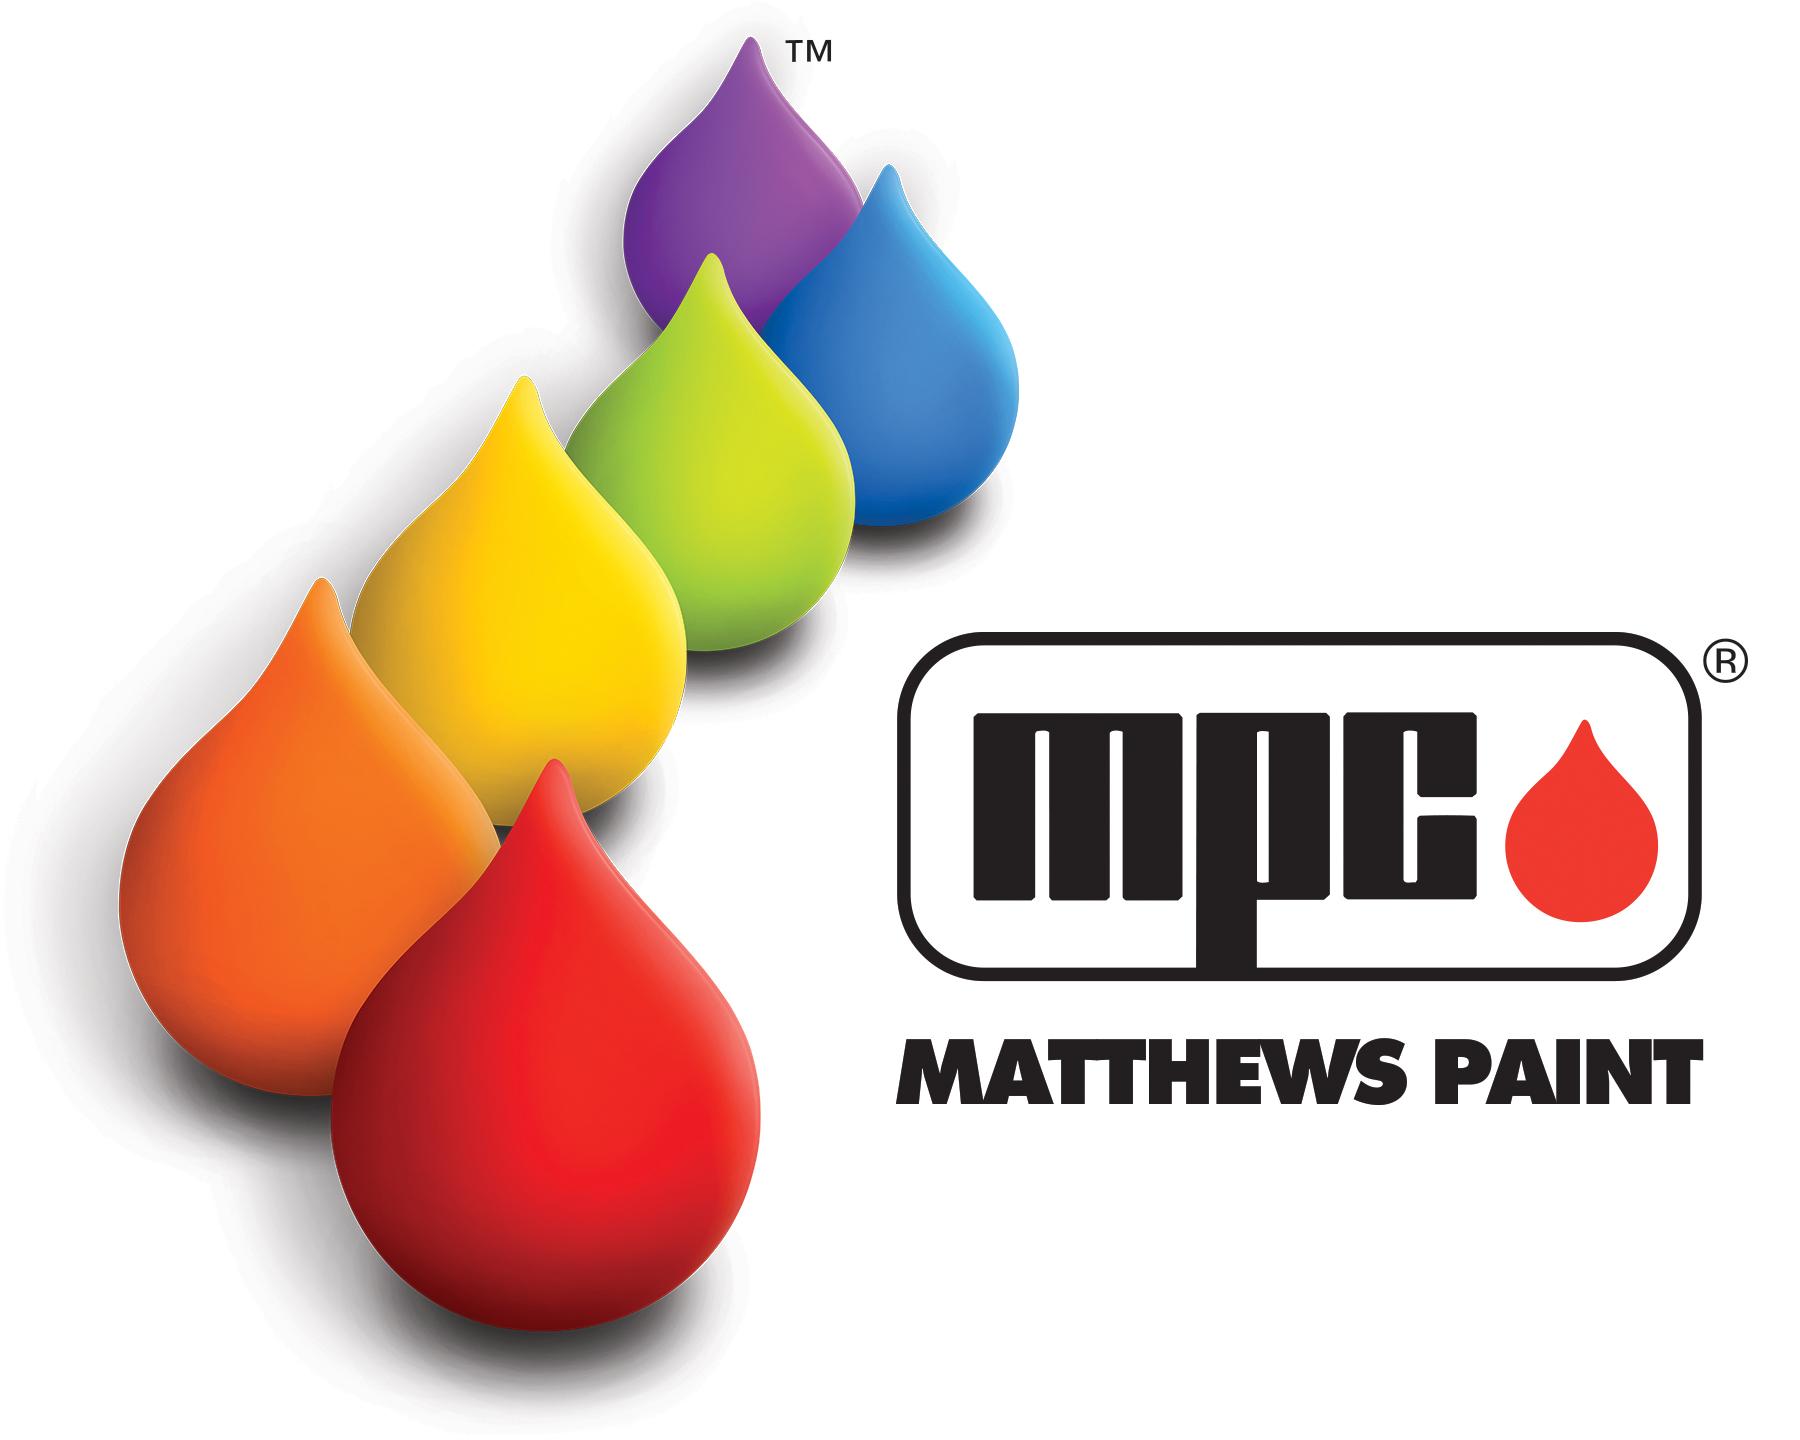 matthews-paint-logo.jpg